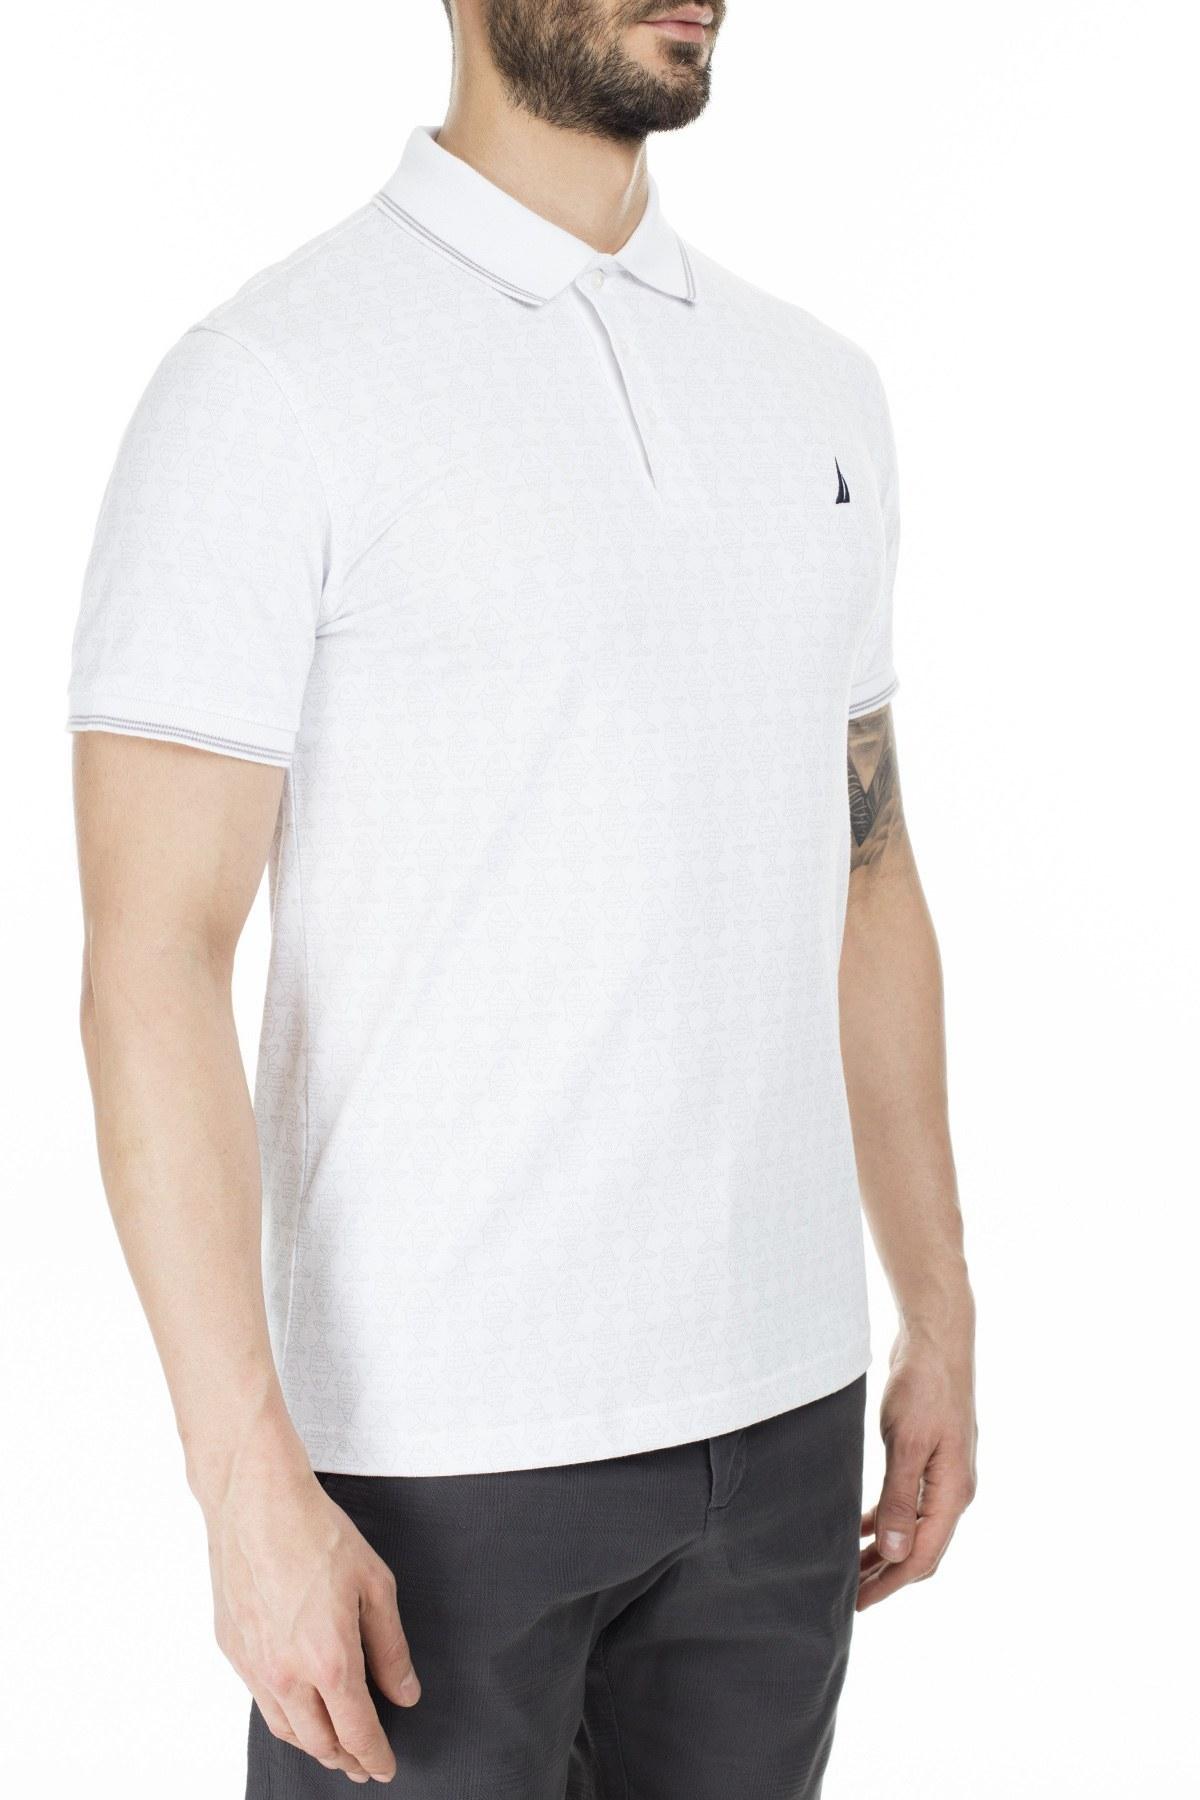 Nautica Slim Fit Yaka T Shirt Erkek Polo K91082T 1BW BEYAZ